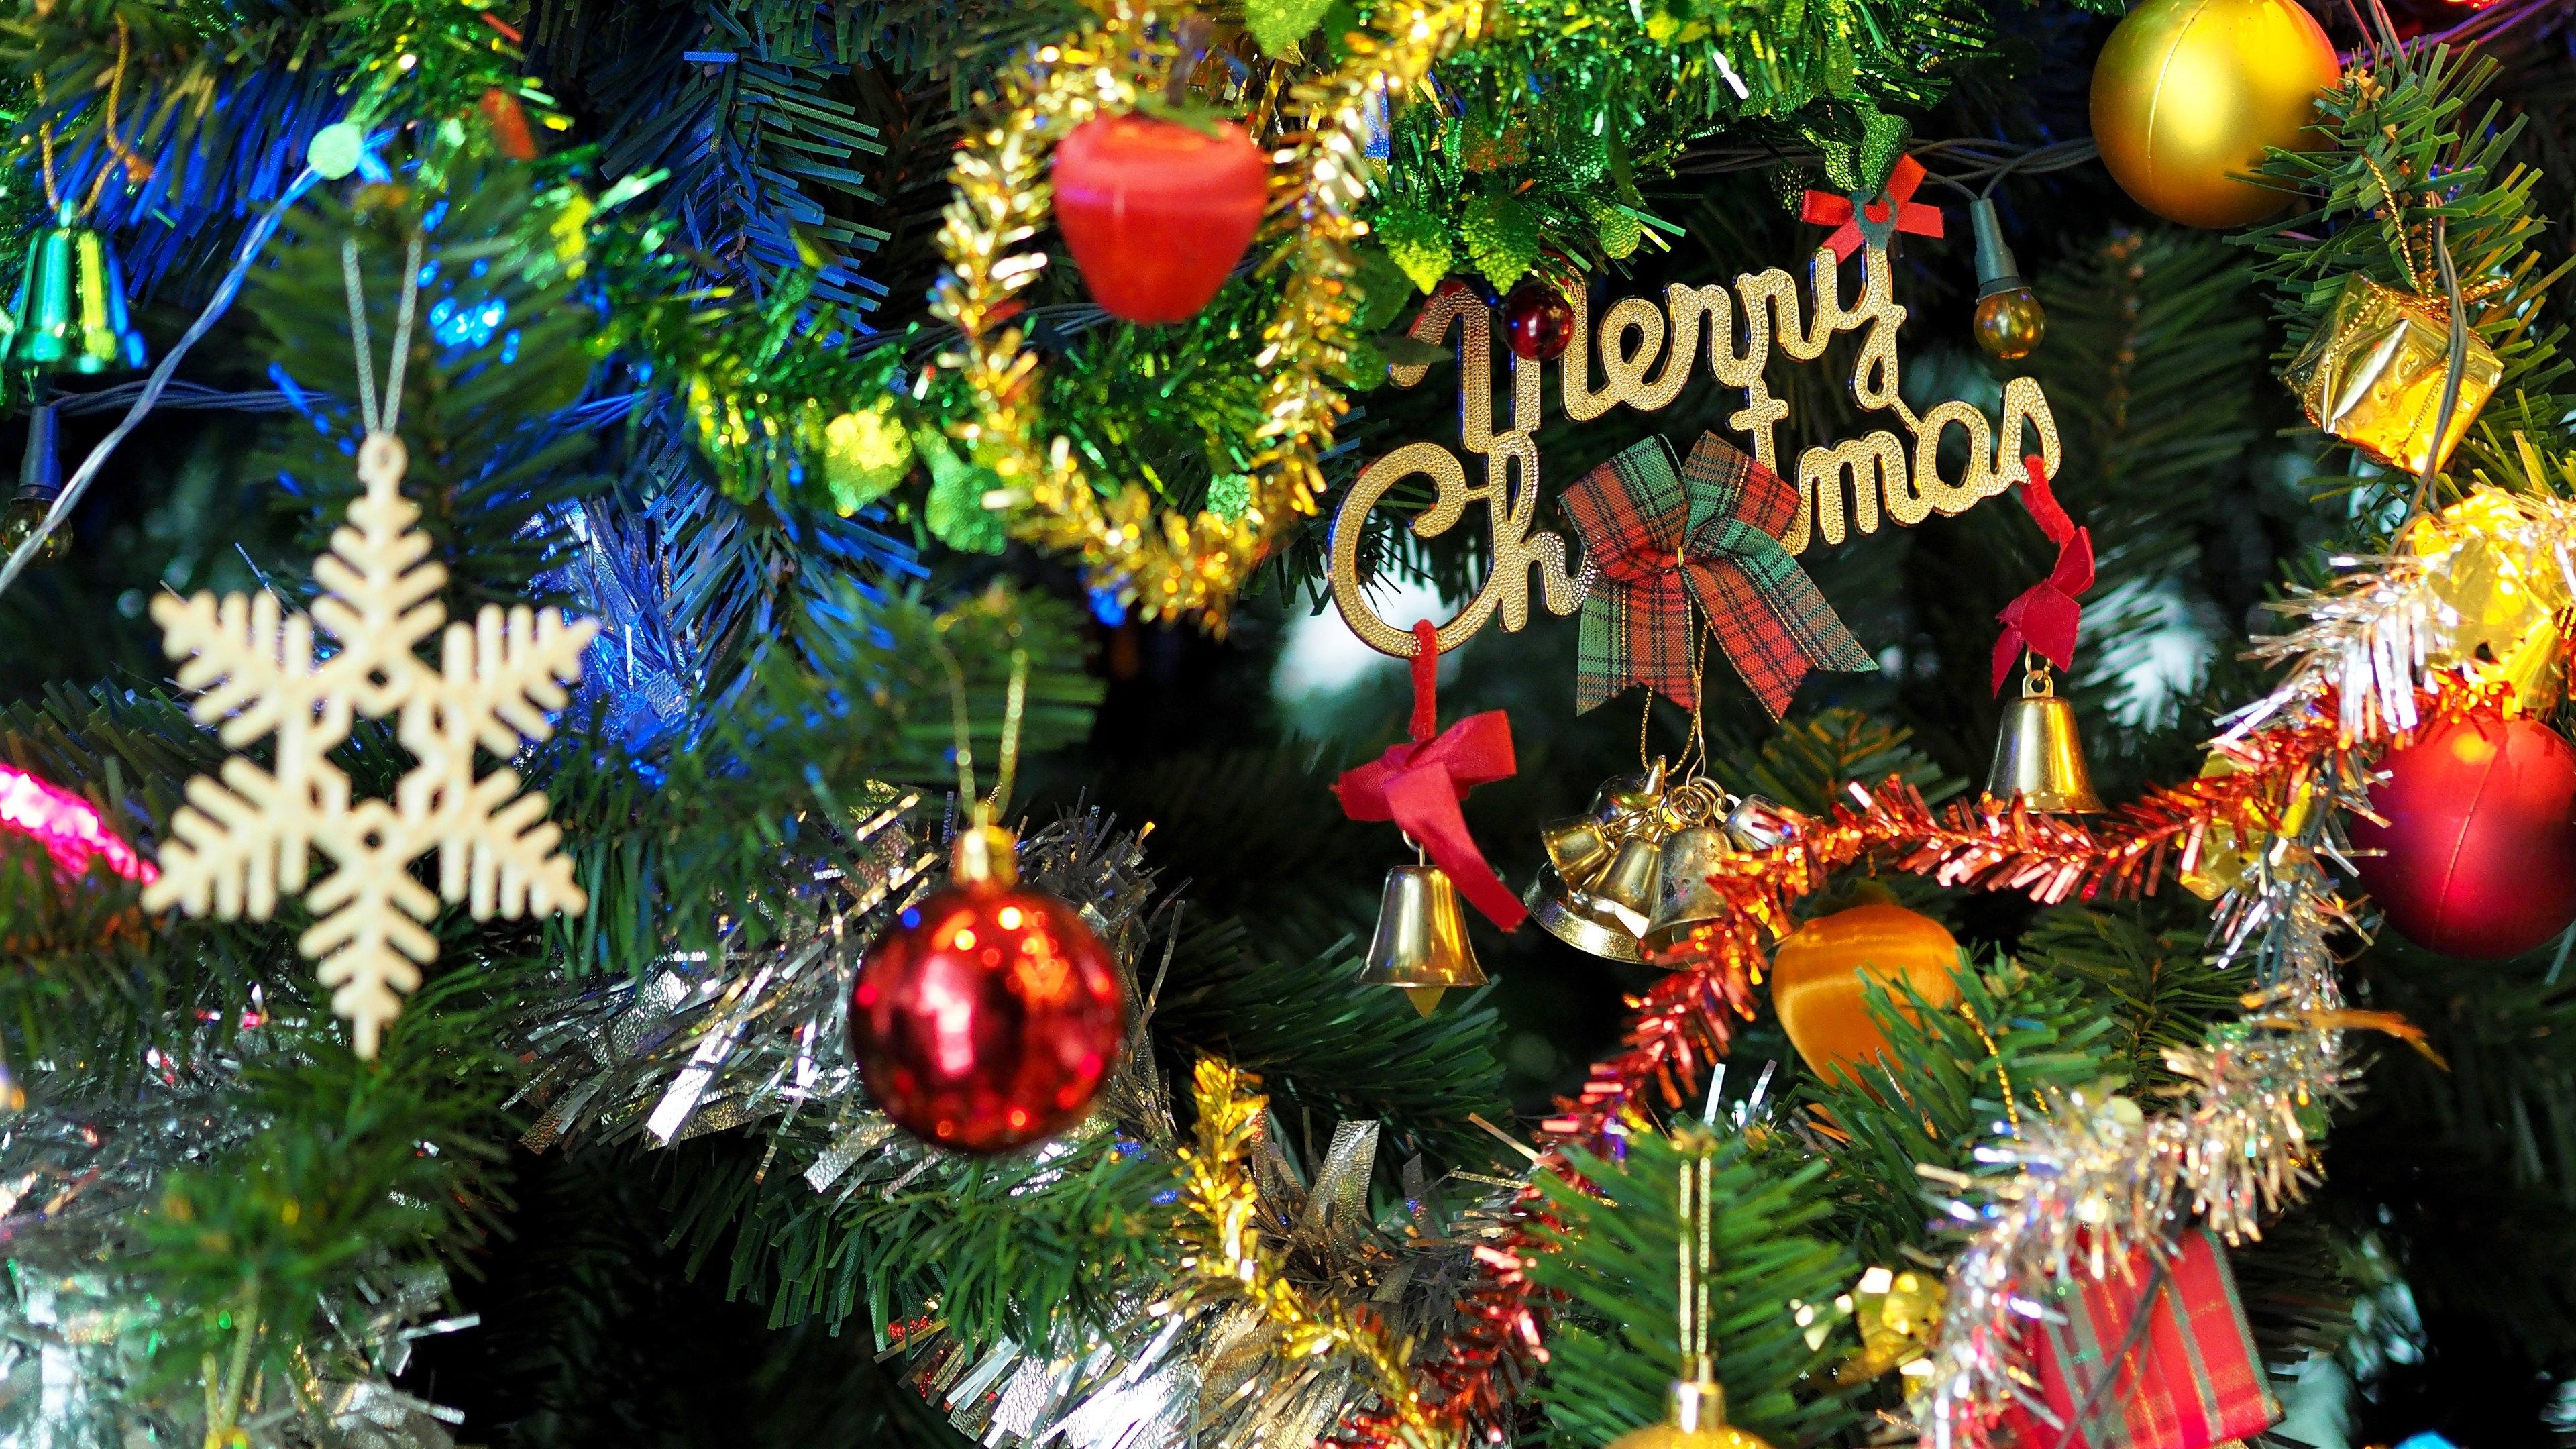 Hd Christmas Wallpapers 4k   3840x2160 Wallpaper   teahubio 3840x2160